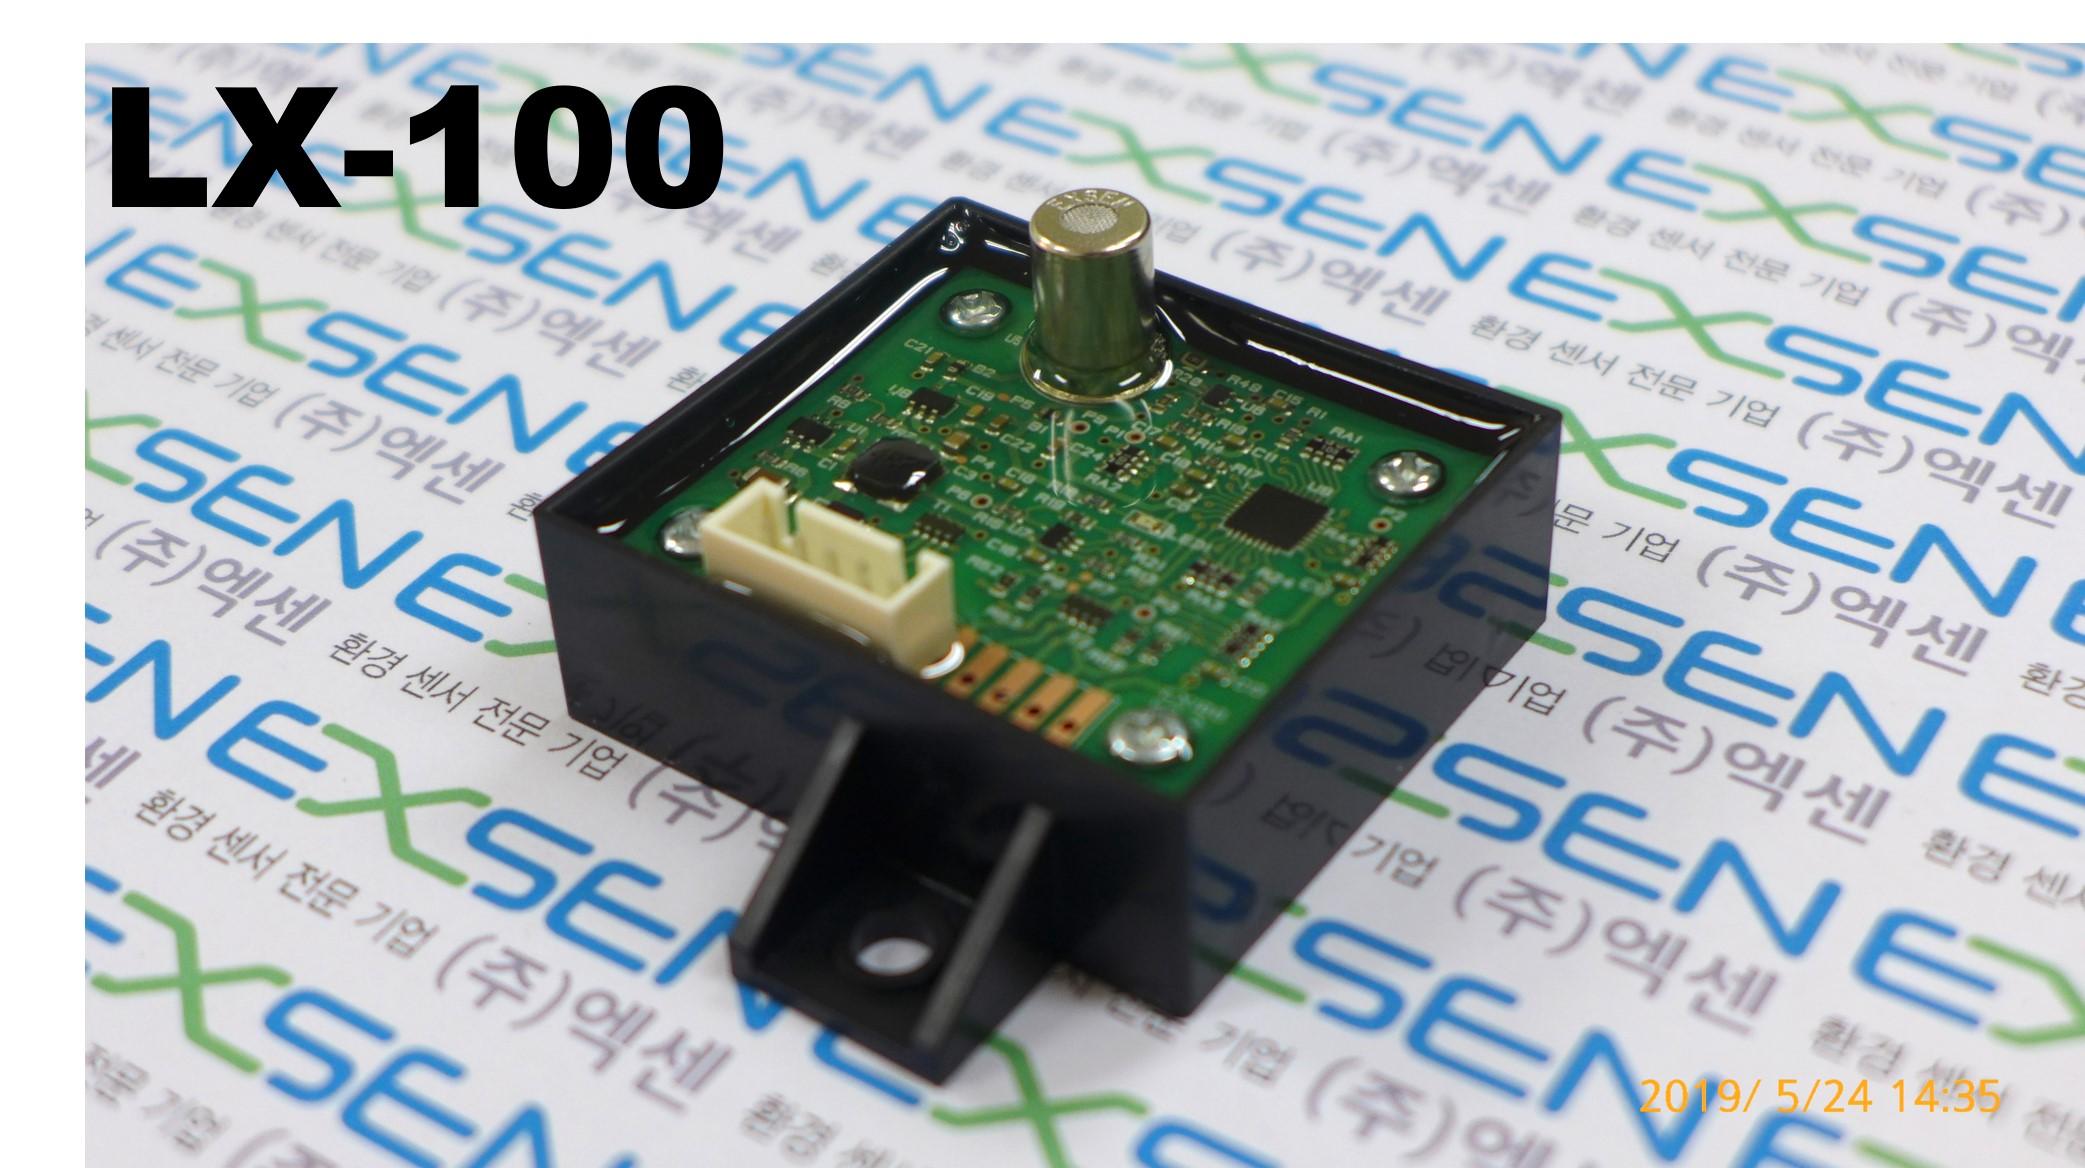 LX-100_001.jpg